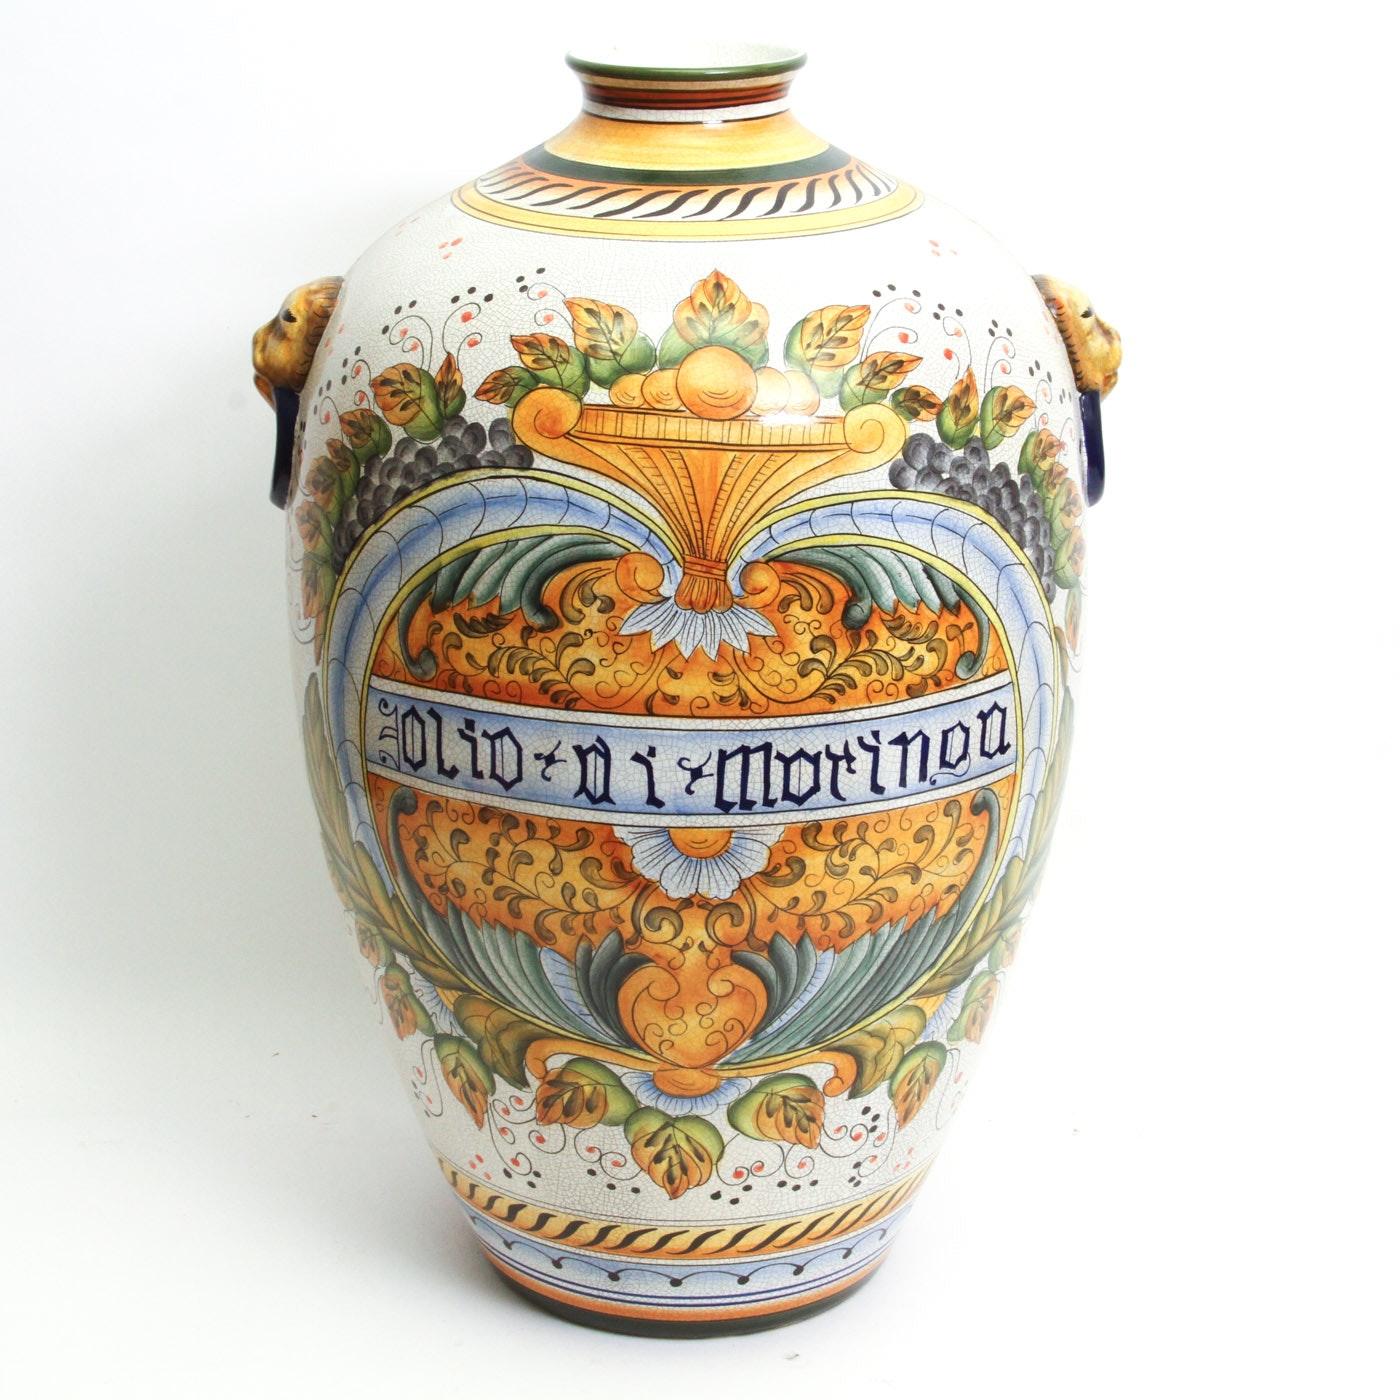 Vintage Italian Ceramic Urn Vase